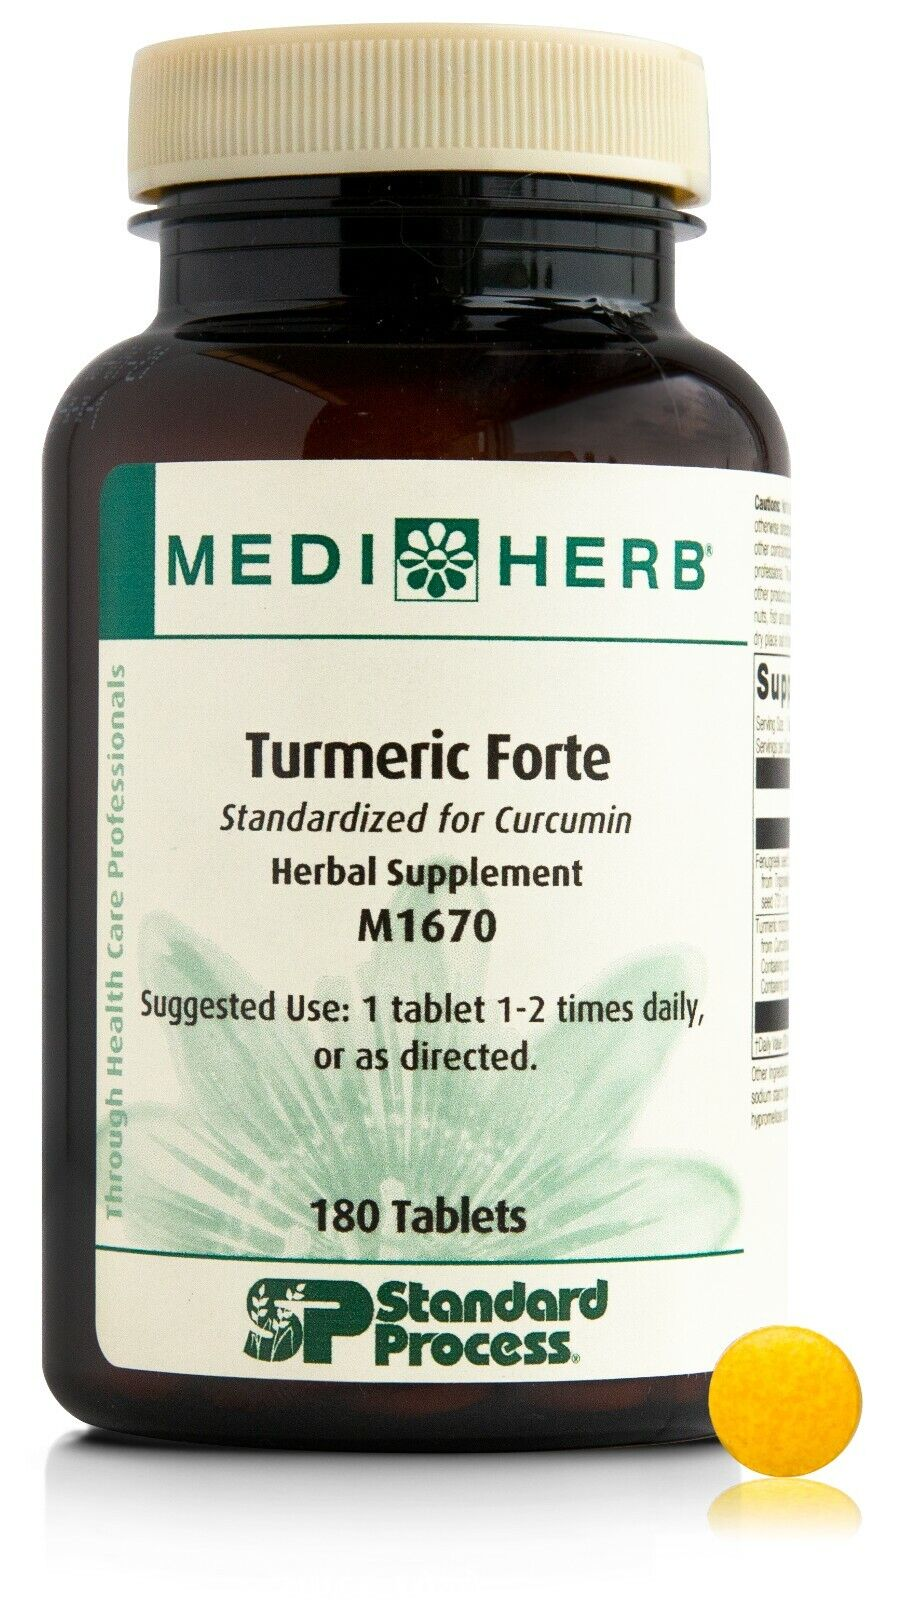 Standard Process - MediHerb - Turmeric Forte 180T  Exp 08/21 - Free shipping